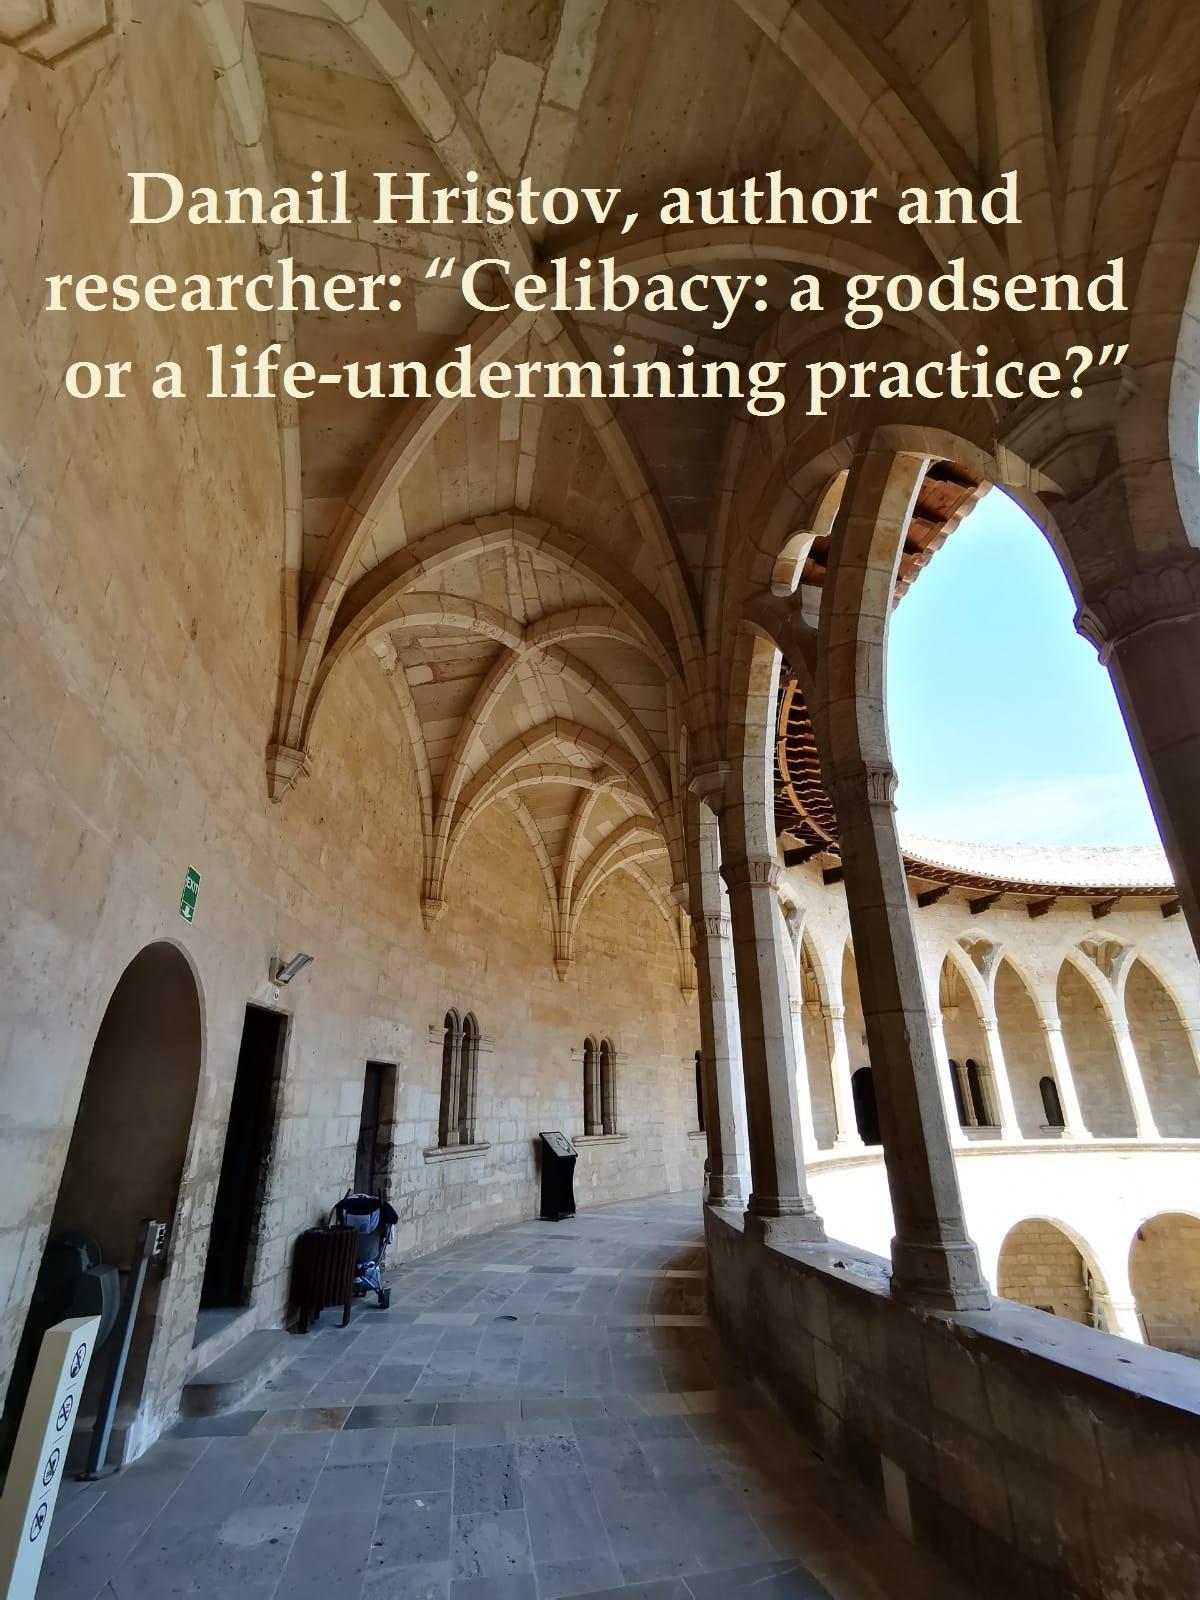 Celibacy: a Godsend or a Life-Undermining Practice